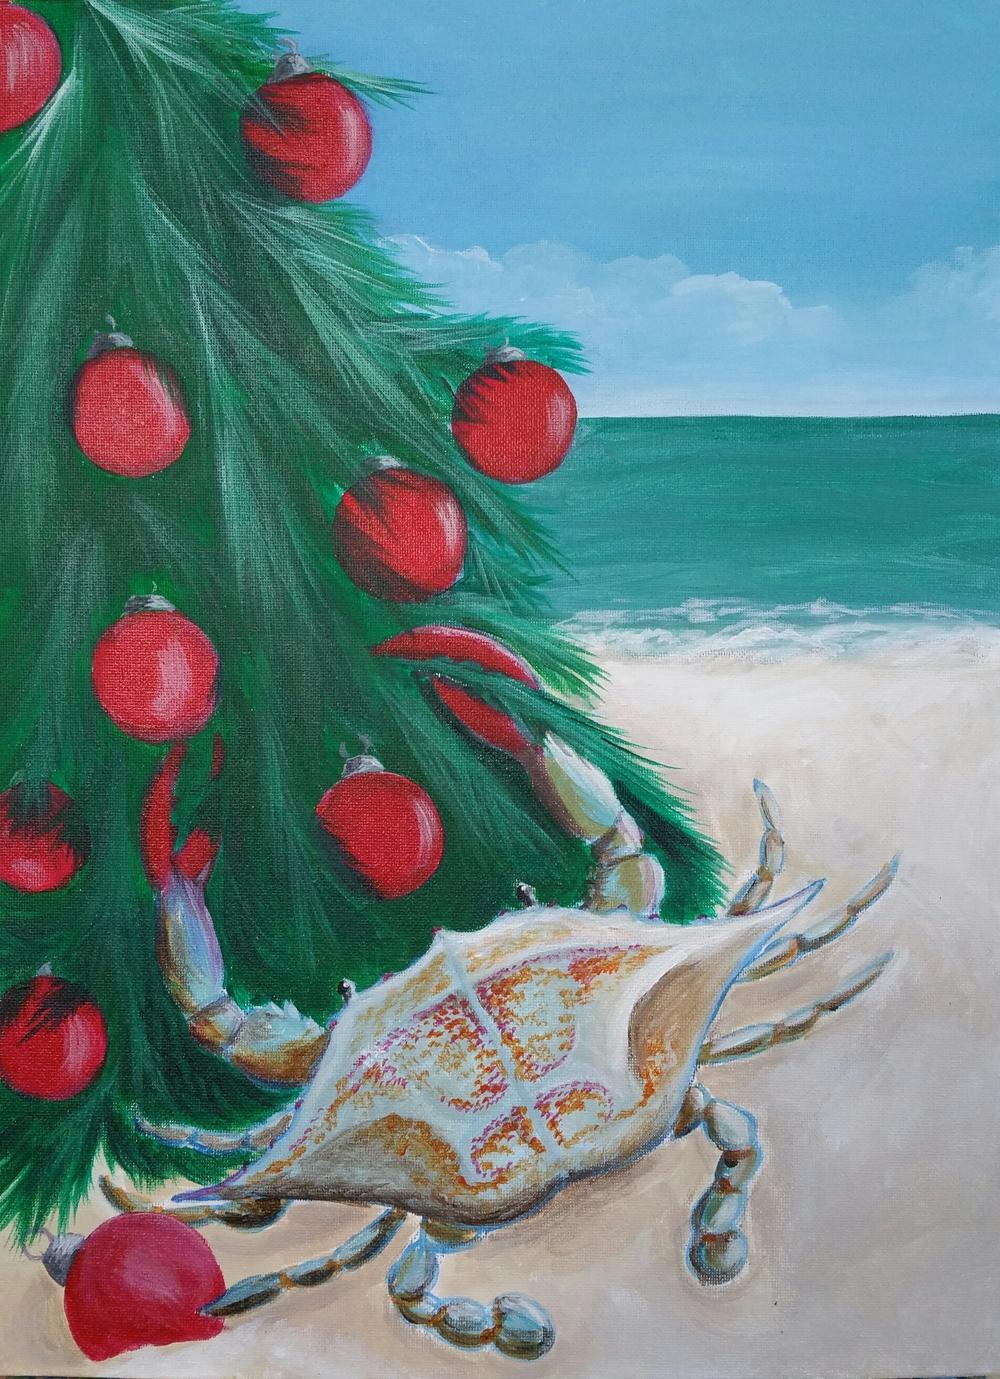 A Crabby Christmas